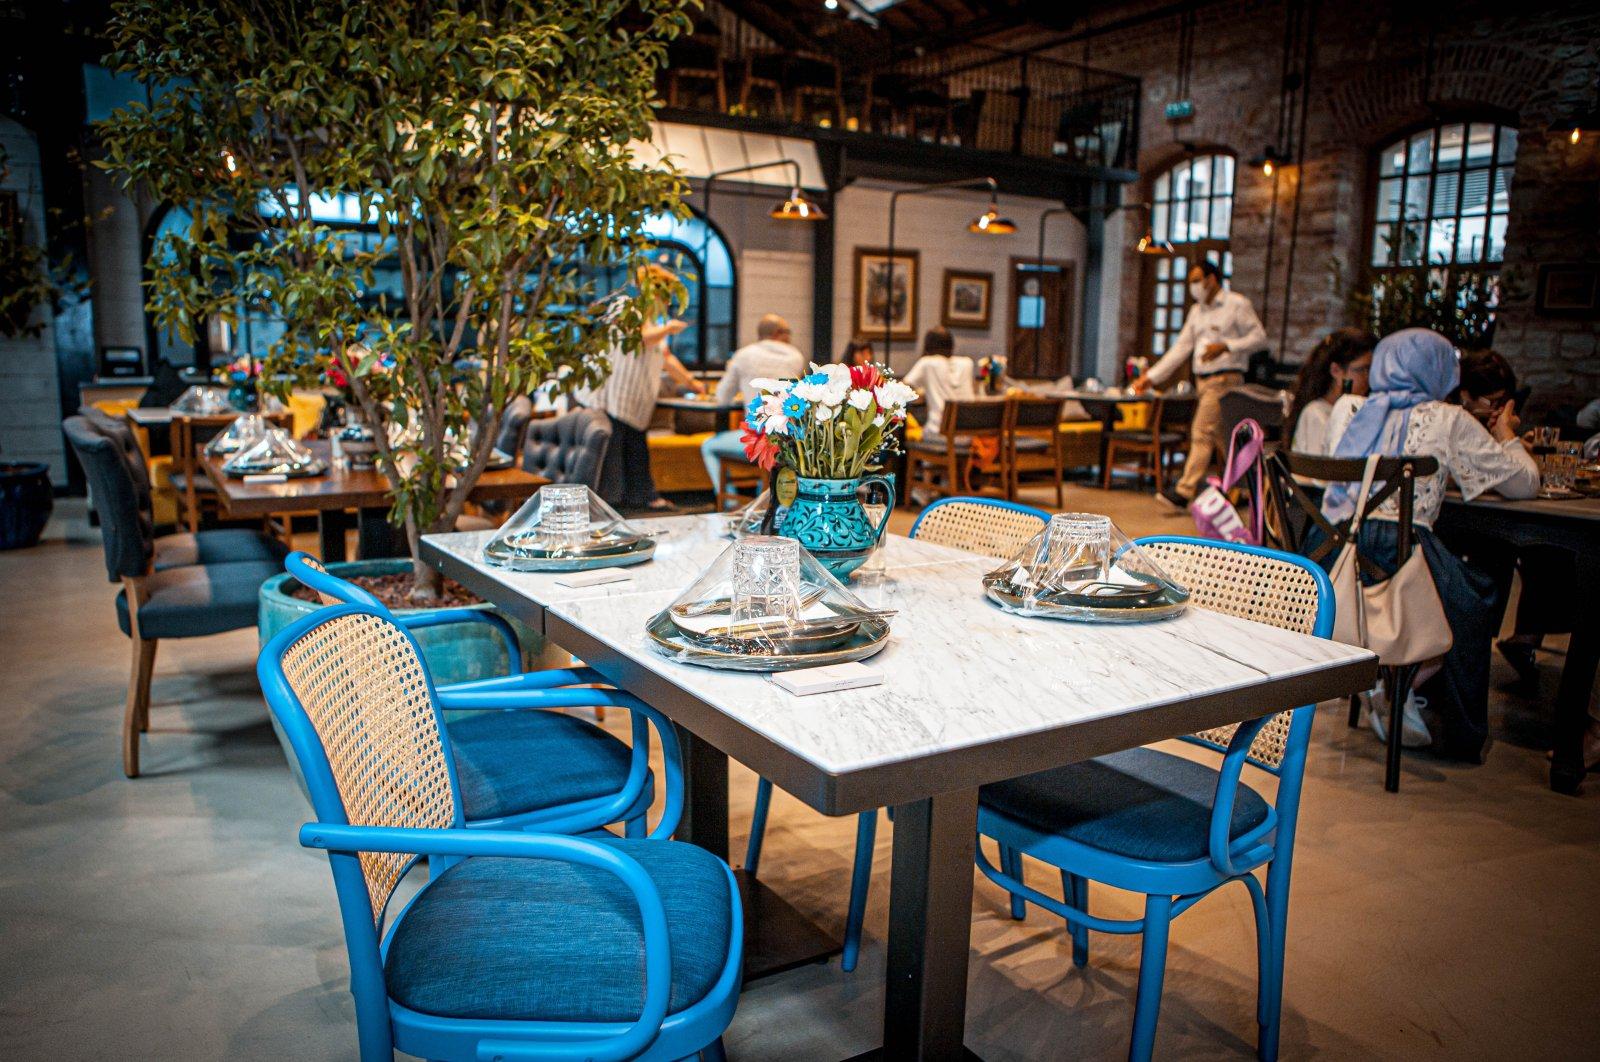 The inside of a restaurant in Istanbul's Zeytinburnu district, Turkey, July 12, 2020. (Sabah Photo)